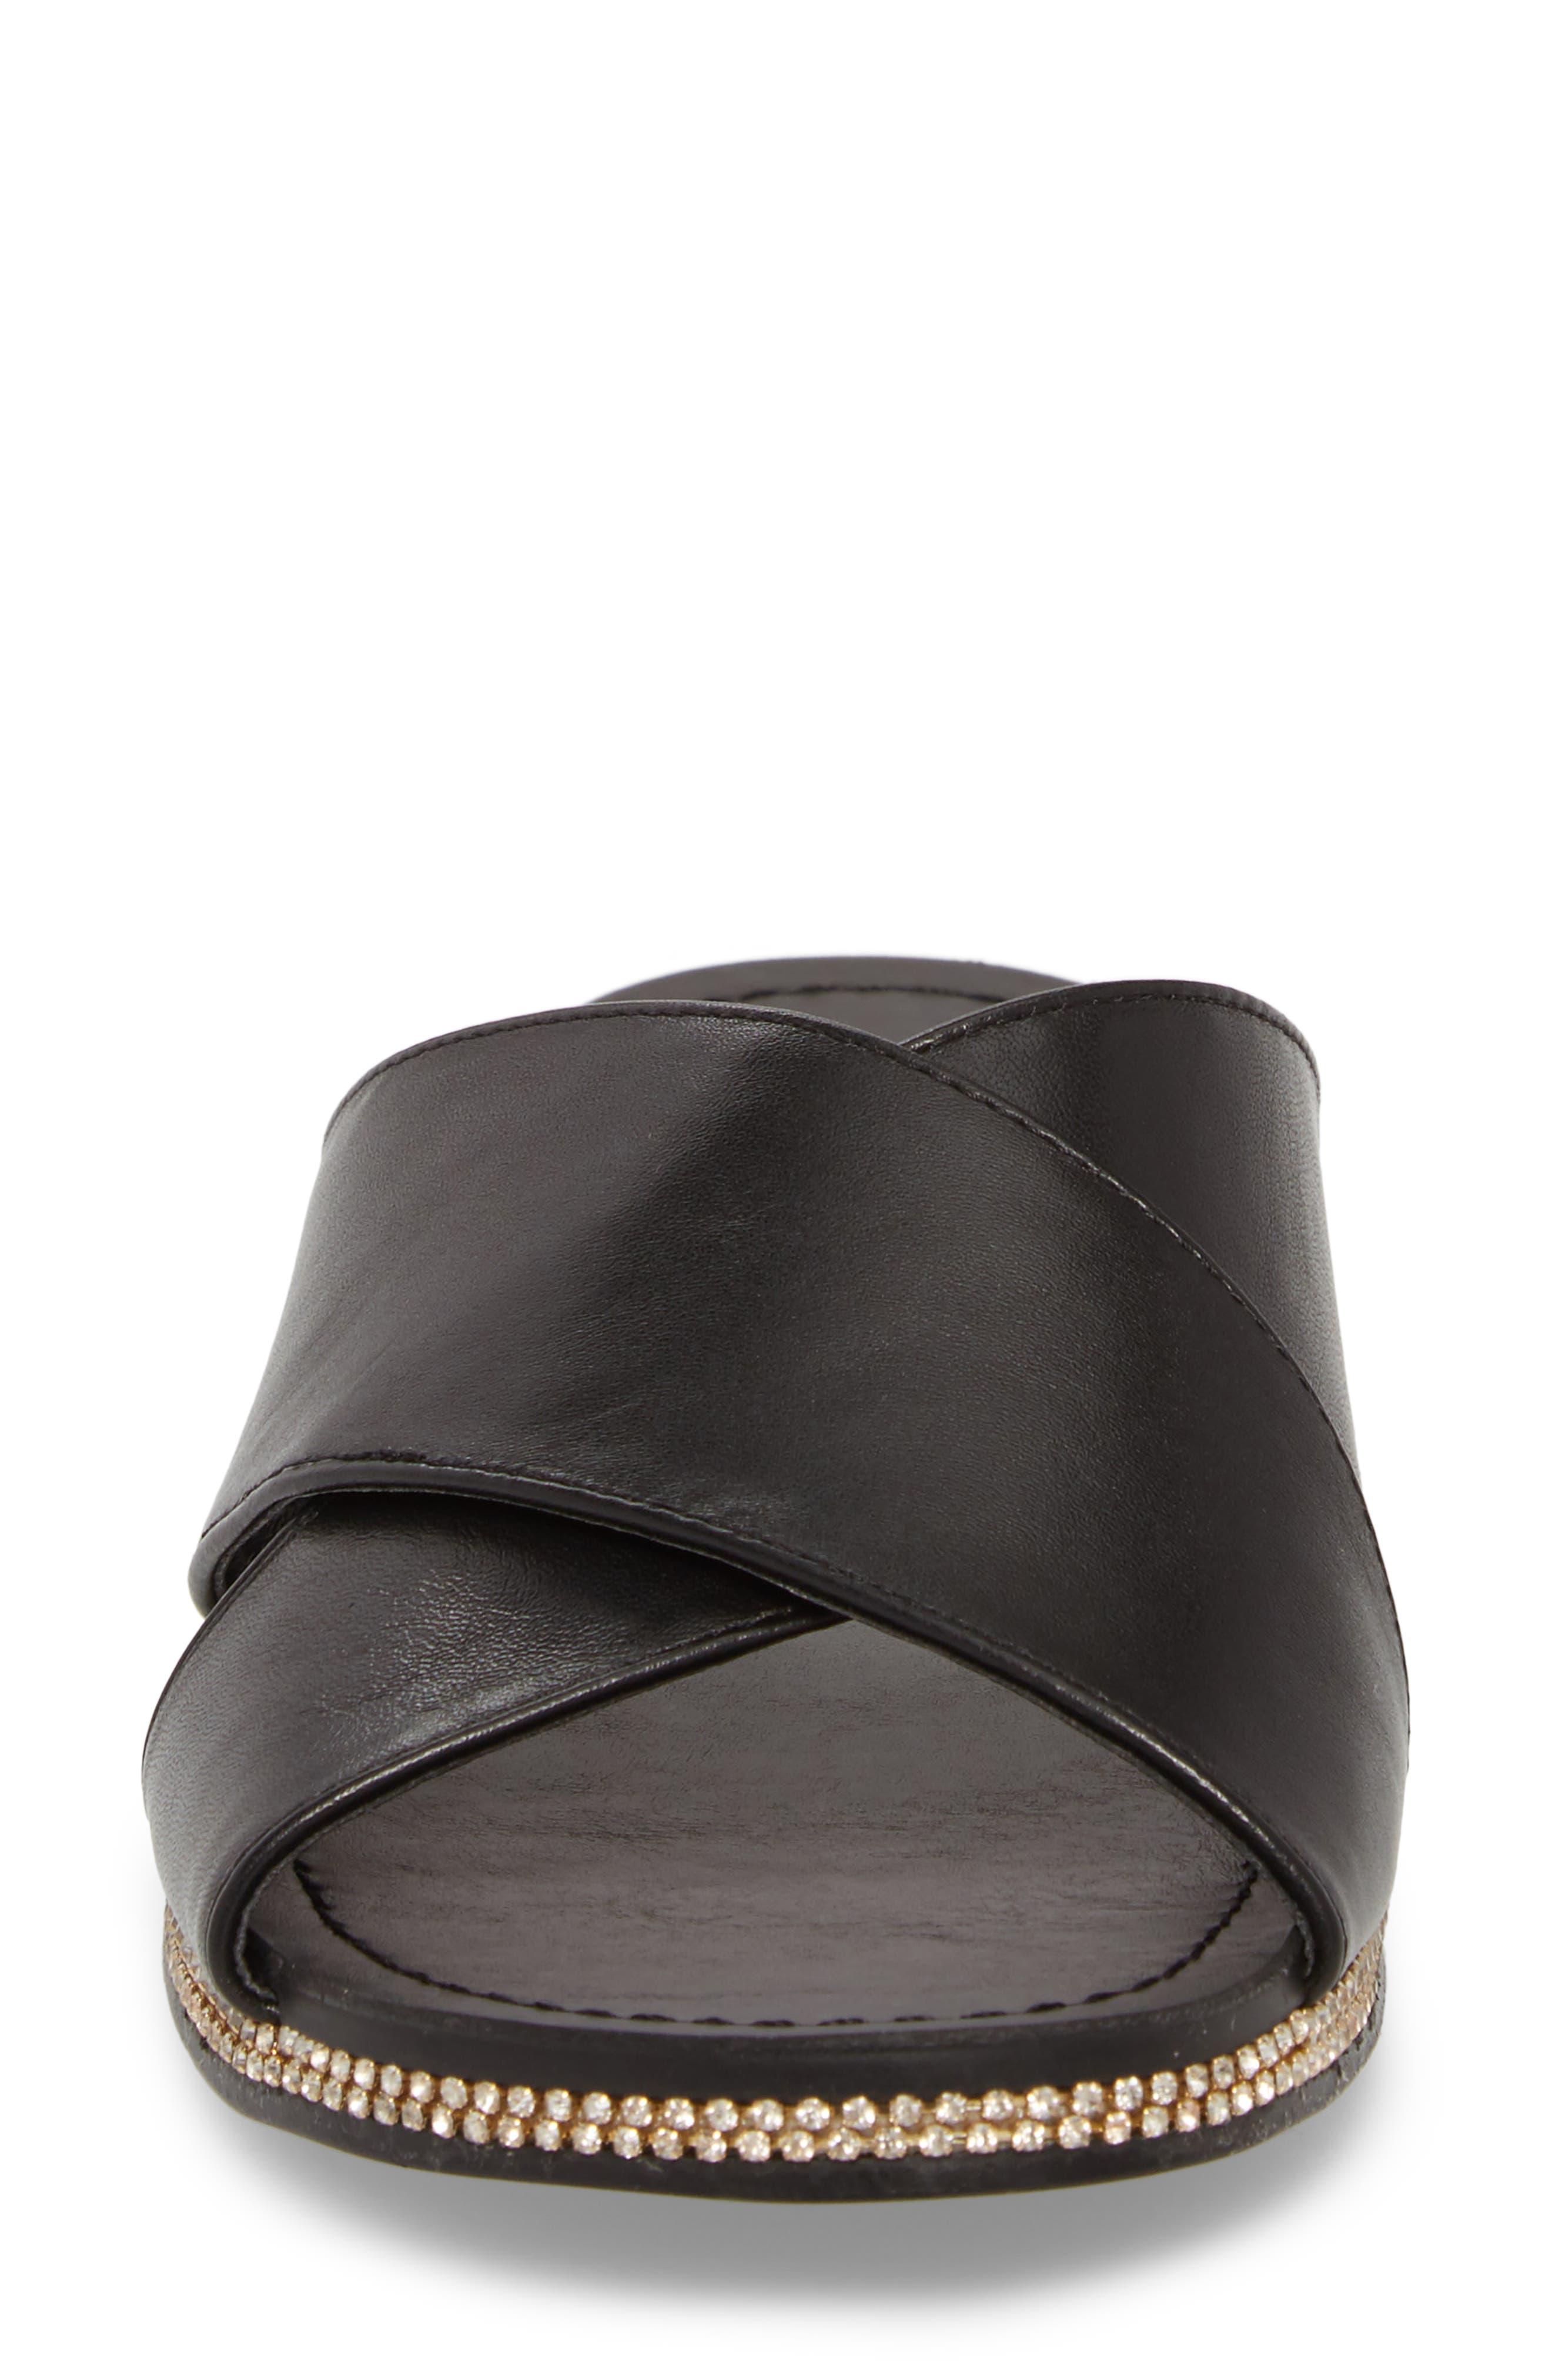 Brinella Sandal,                             Alternate thumbnail 4, color,                             Black